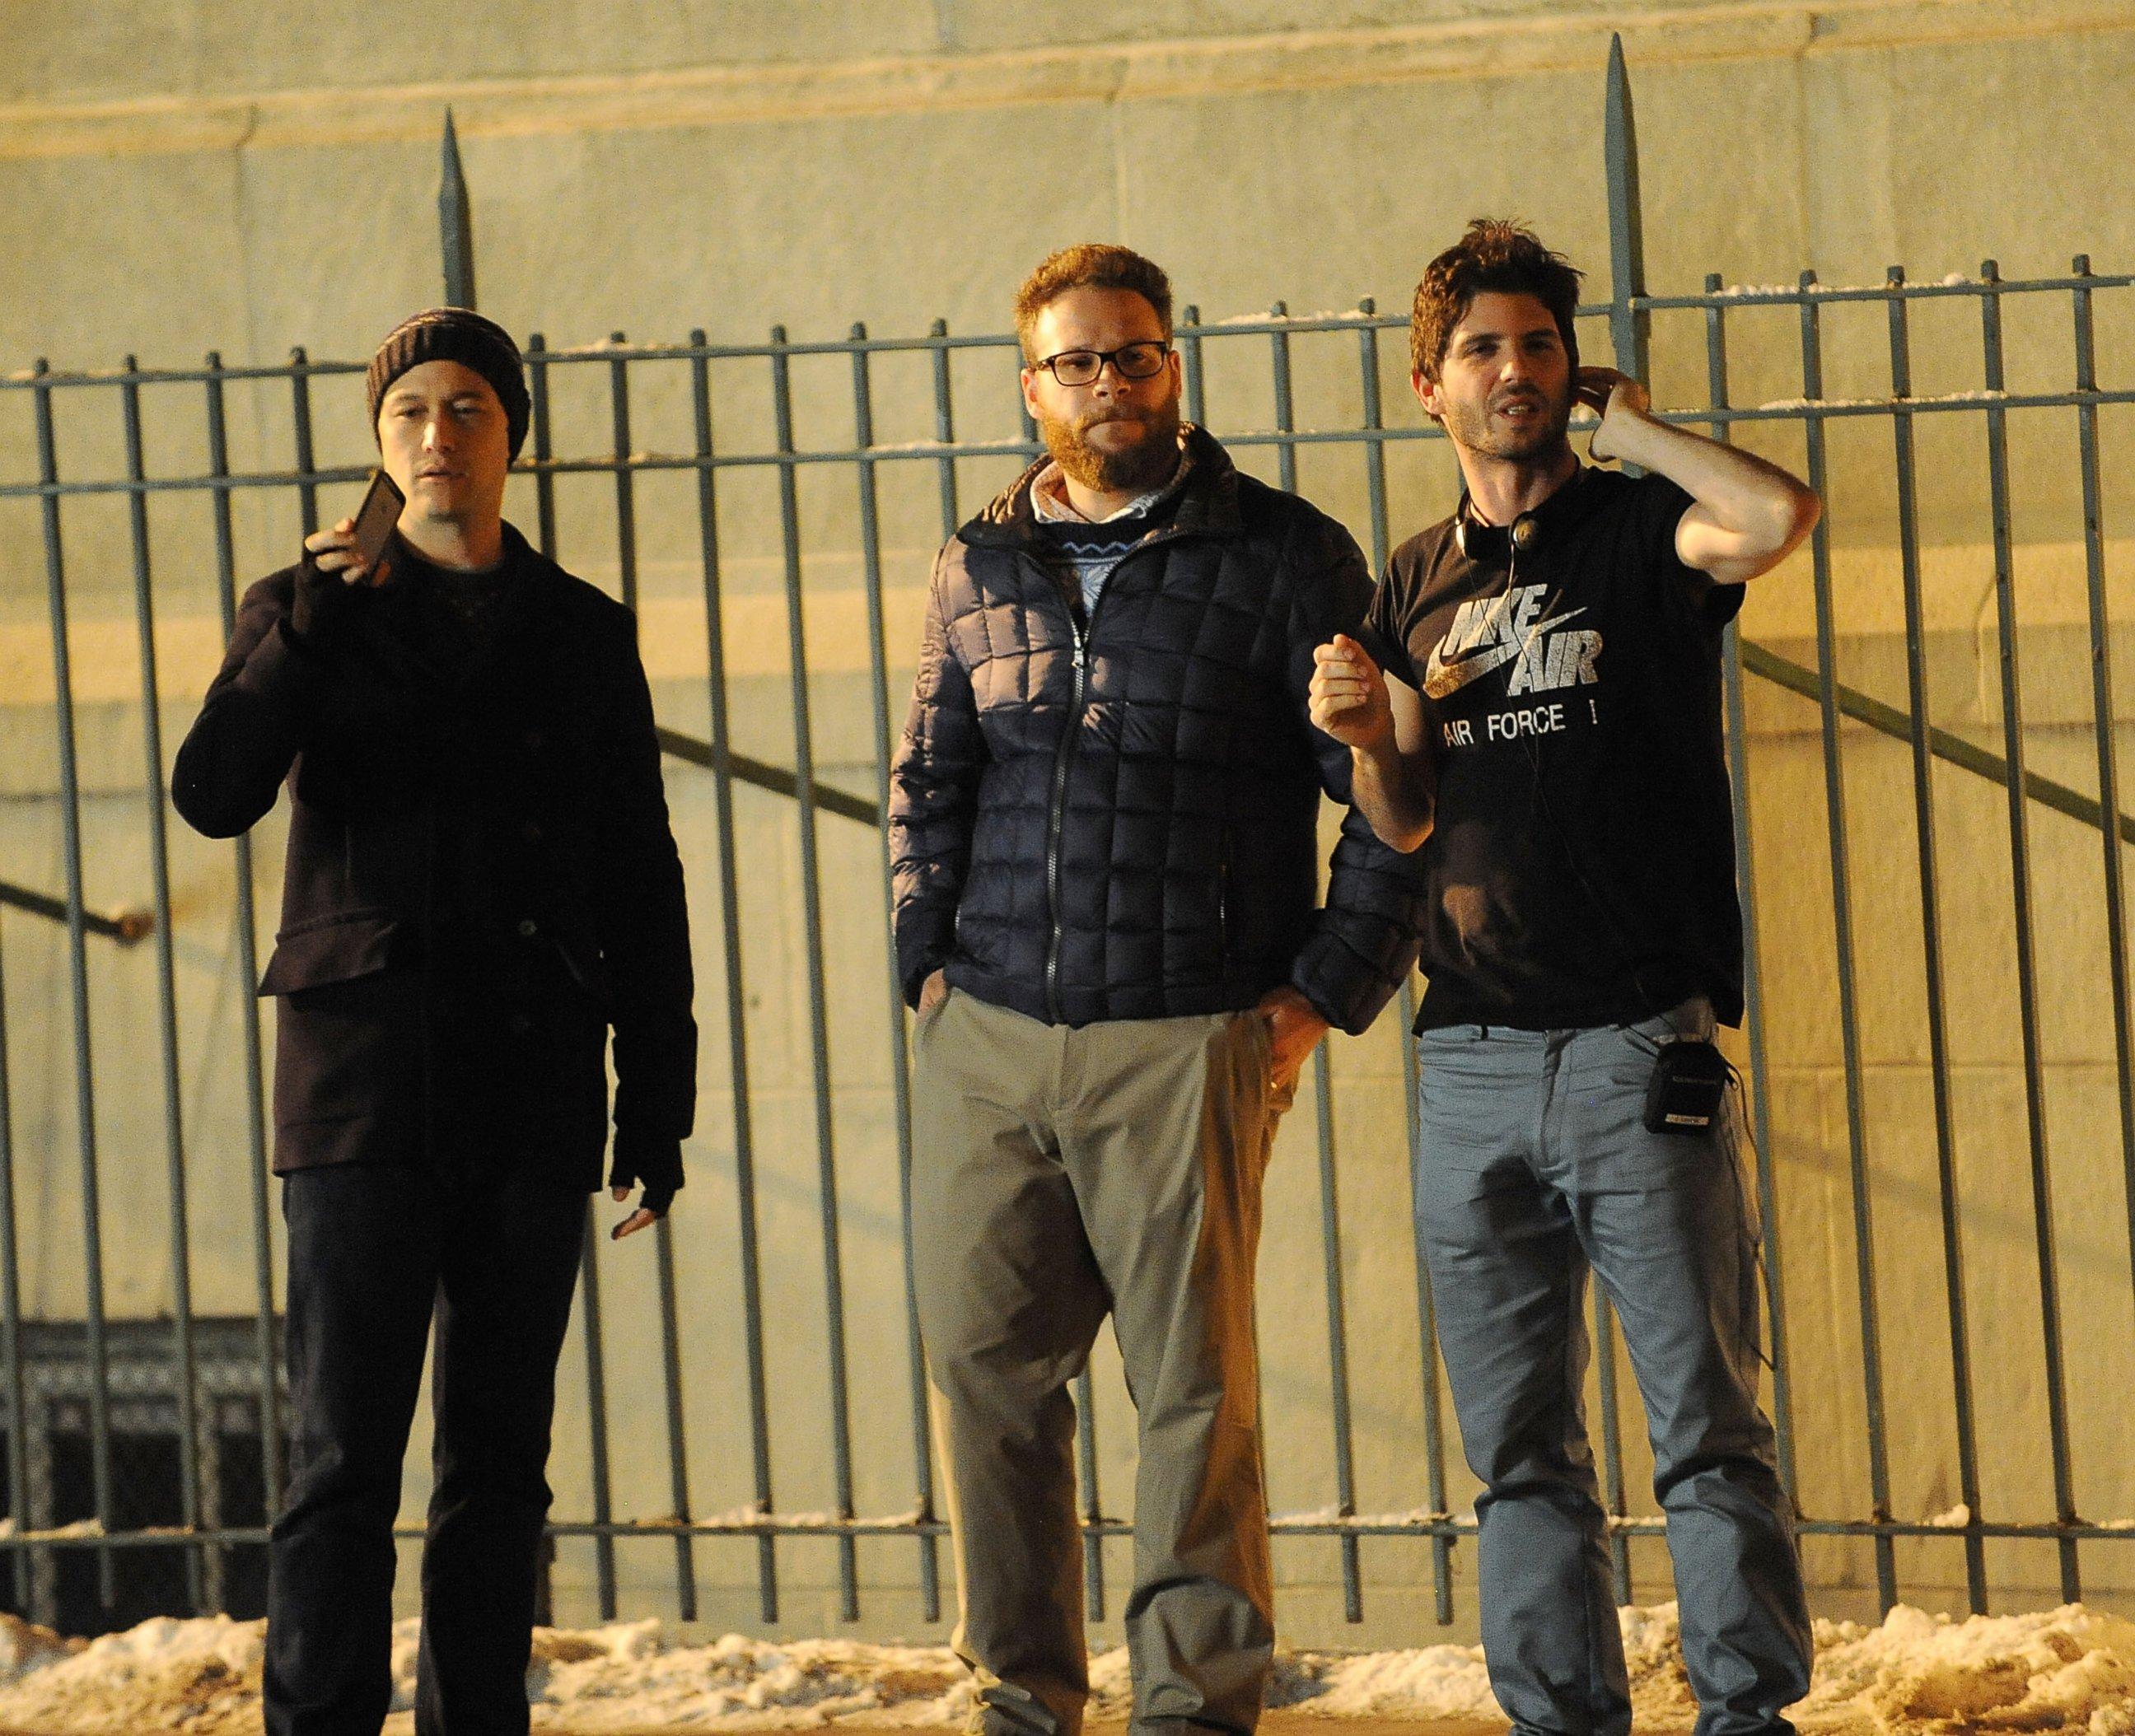 Seth Rogen Shoots Christmas Project with Joseph Gordon-Levitt